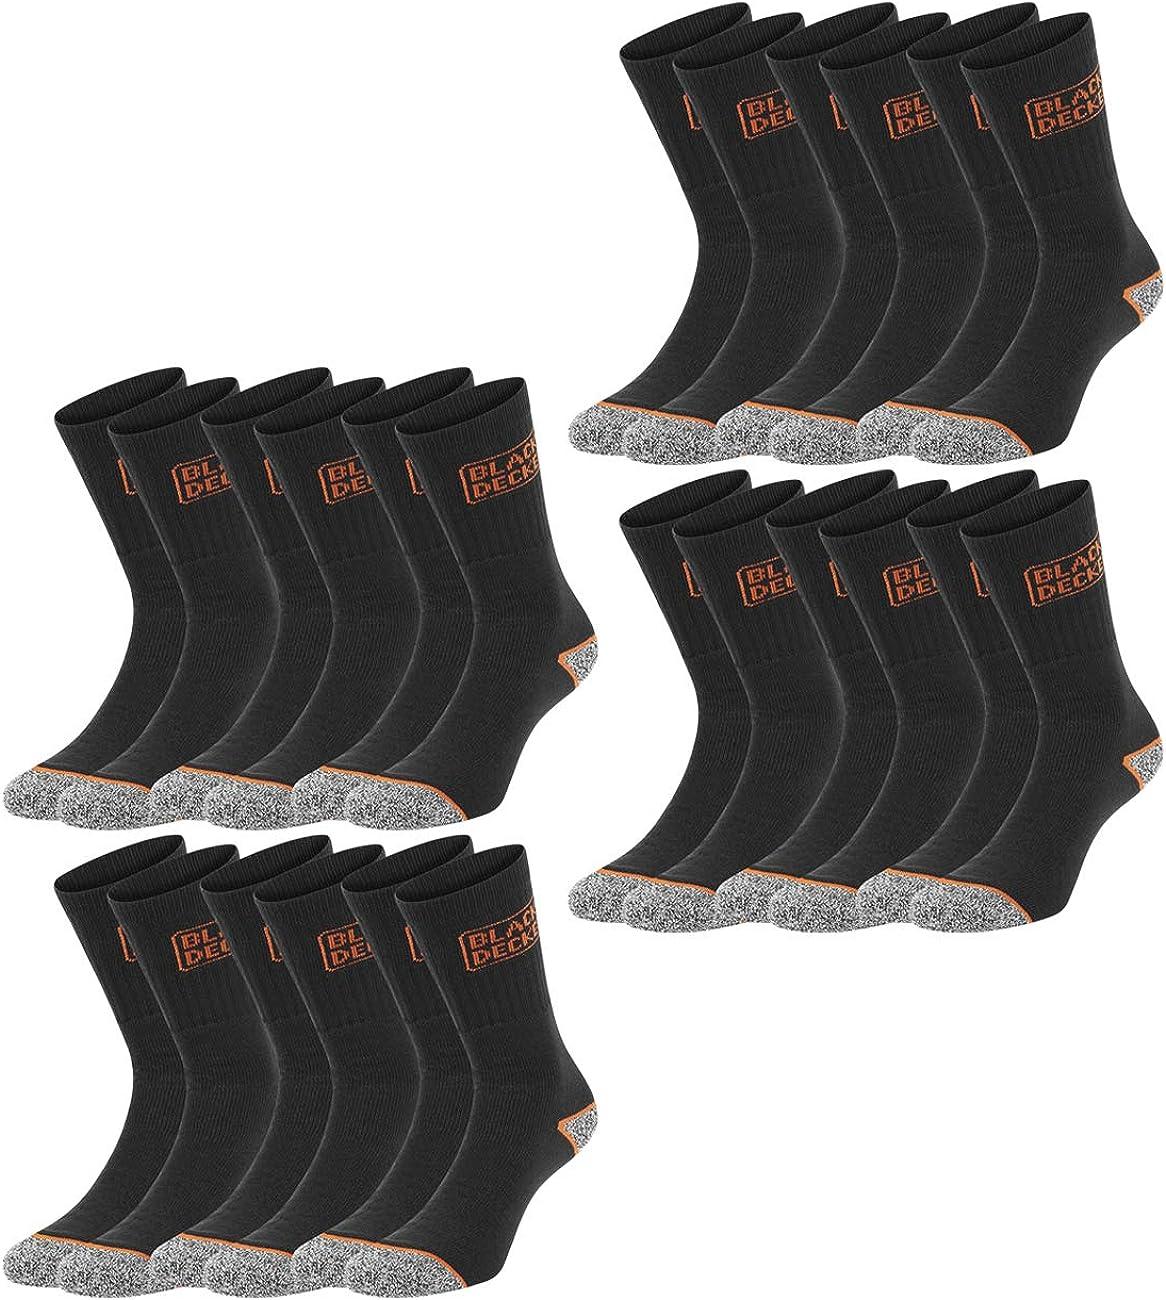 Blakläder Socken 2er-Pack DRY Arbeitssocken schwarz neon grün Workersocks Socks